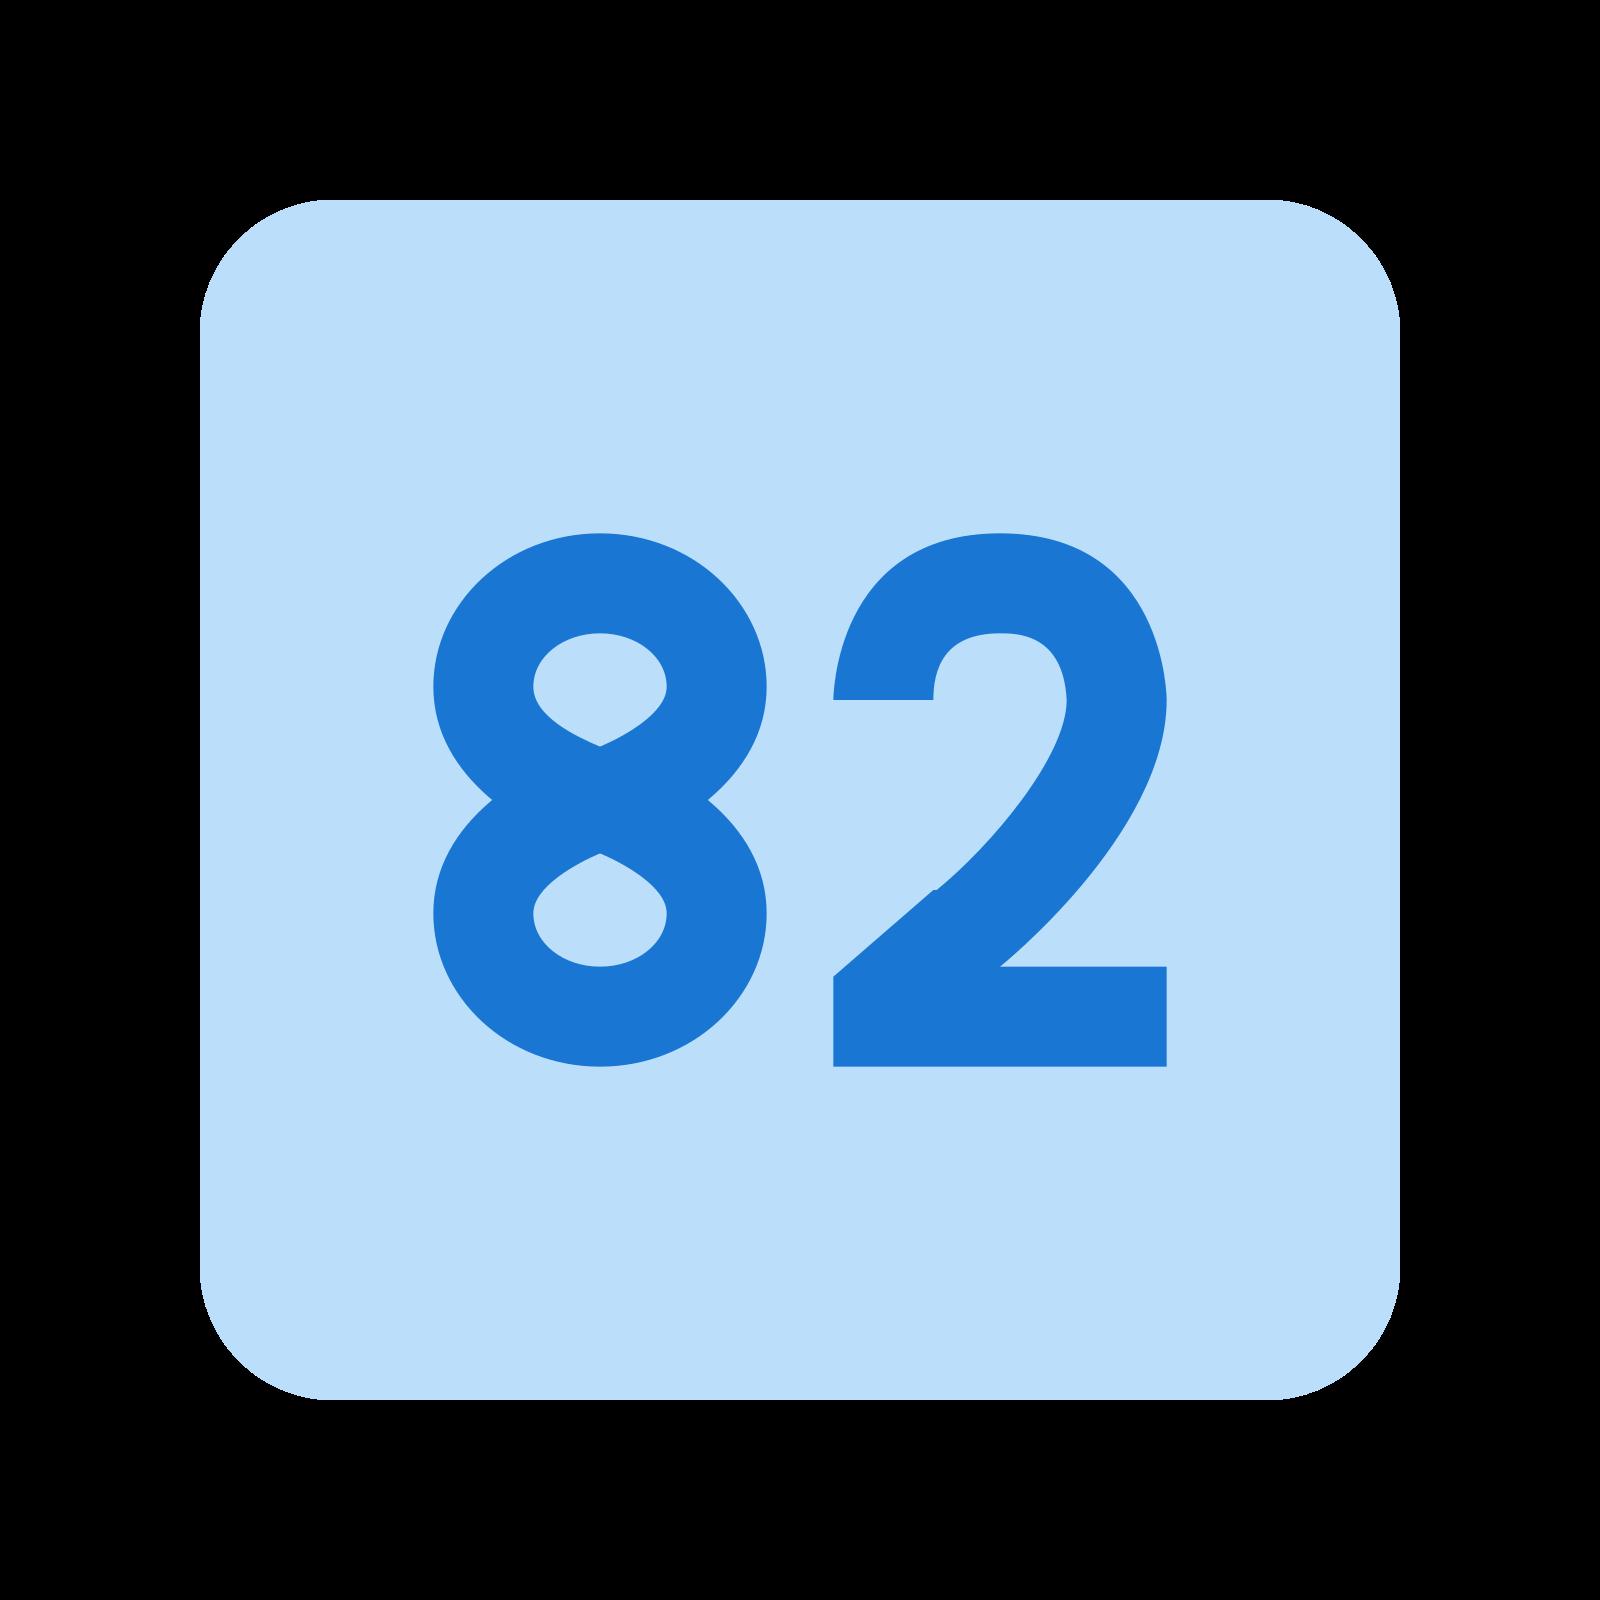 82 icon